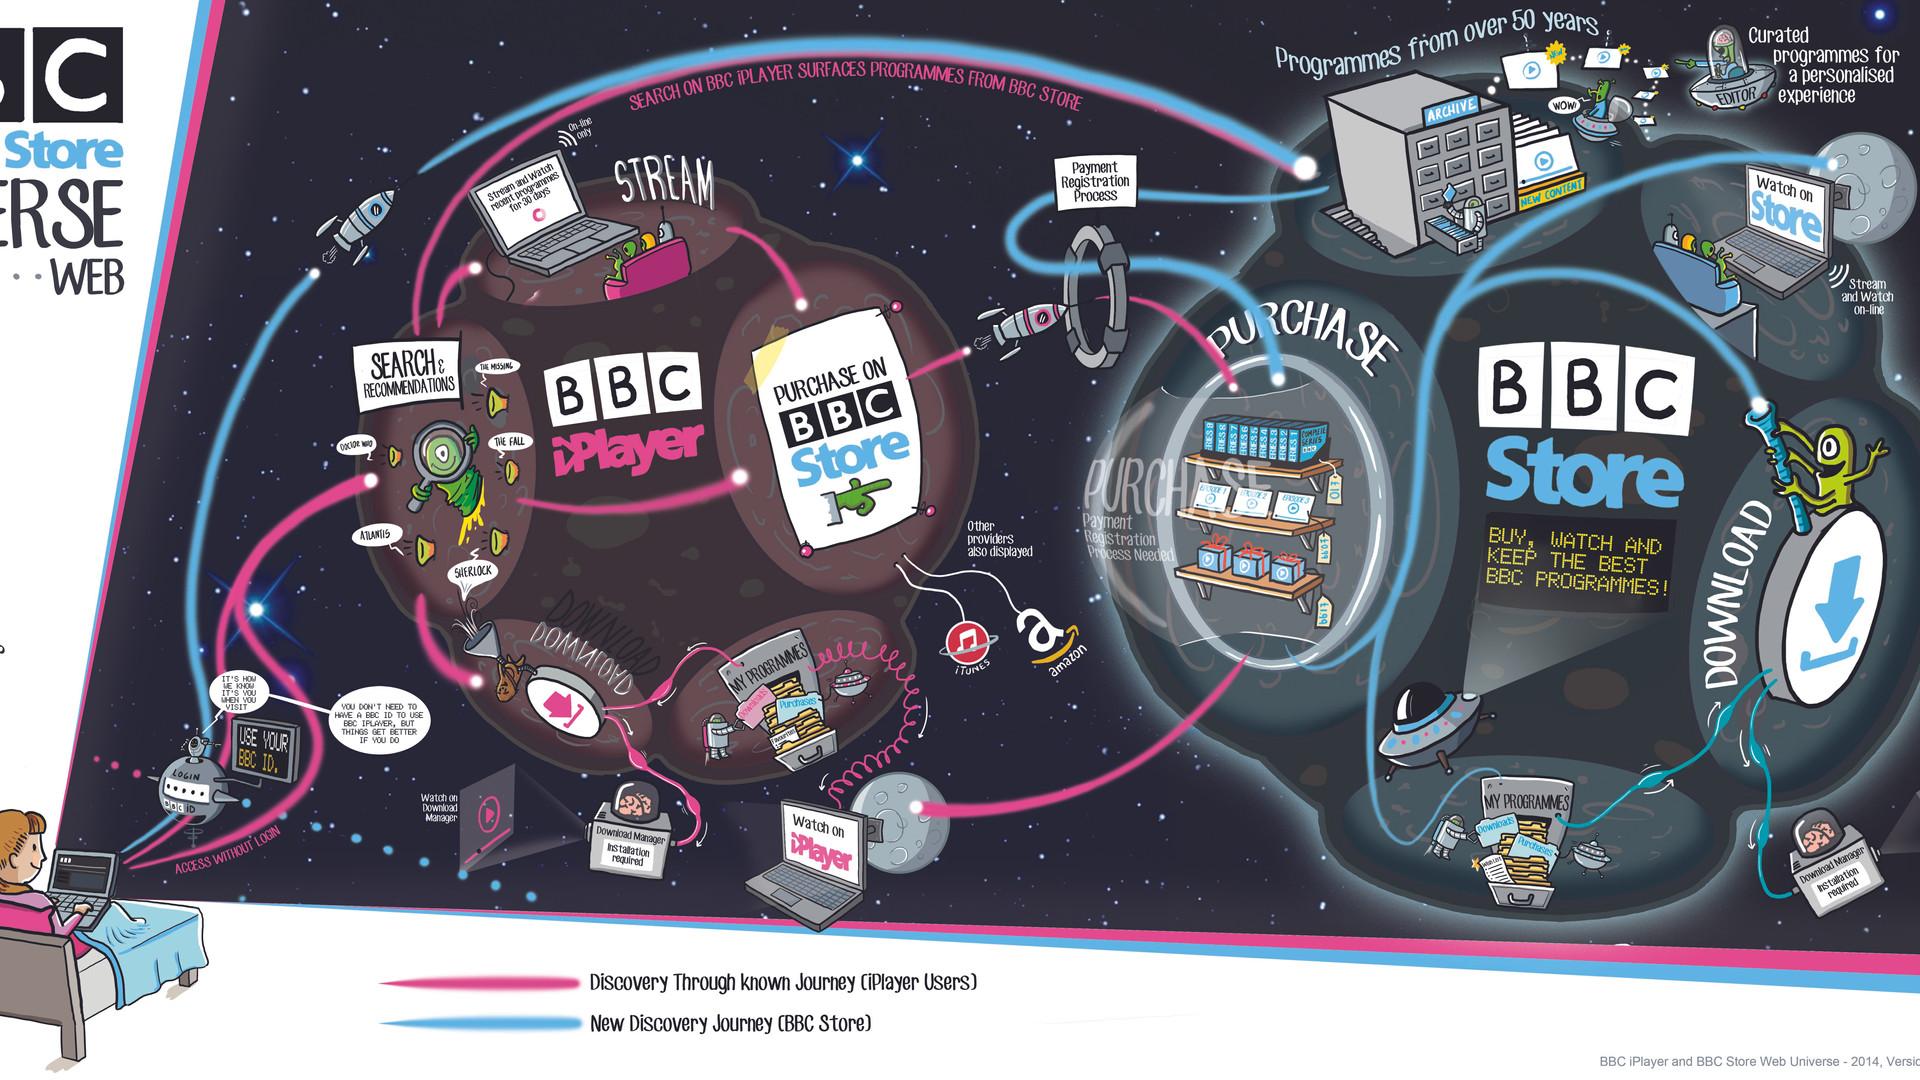 BBC iPlayer & BBC Store Web Universe.jpg